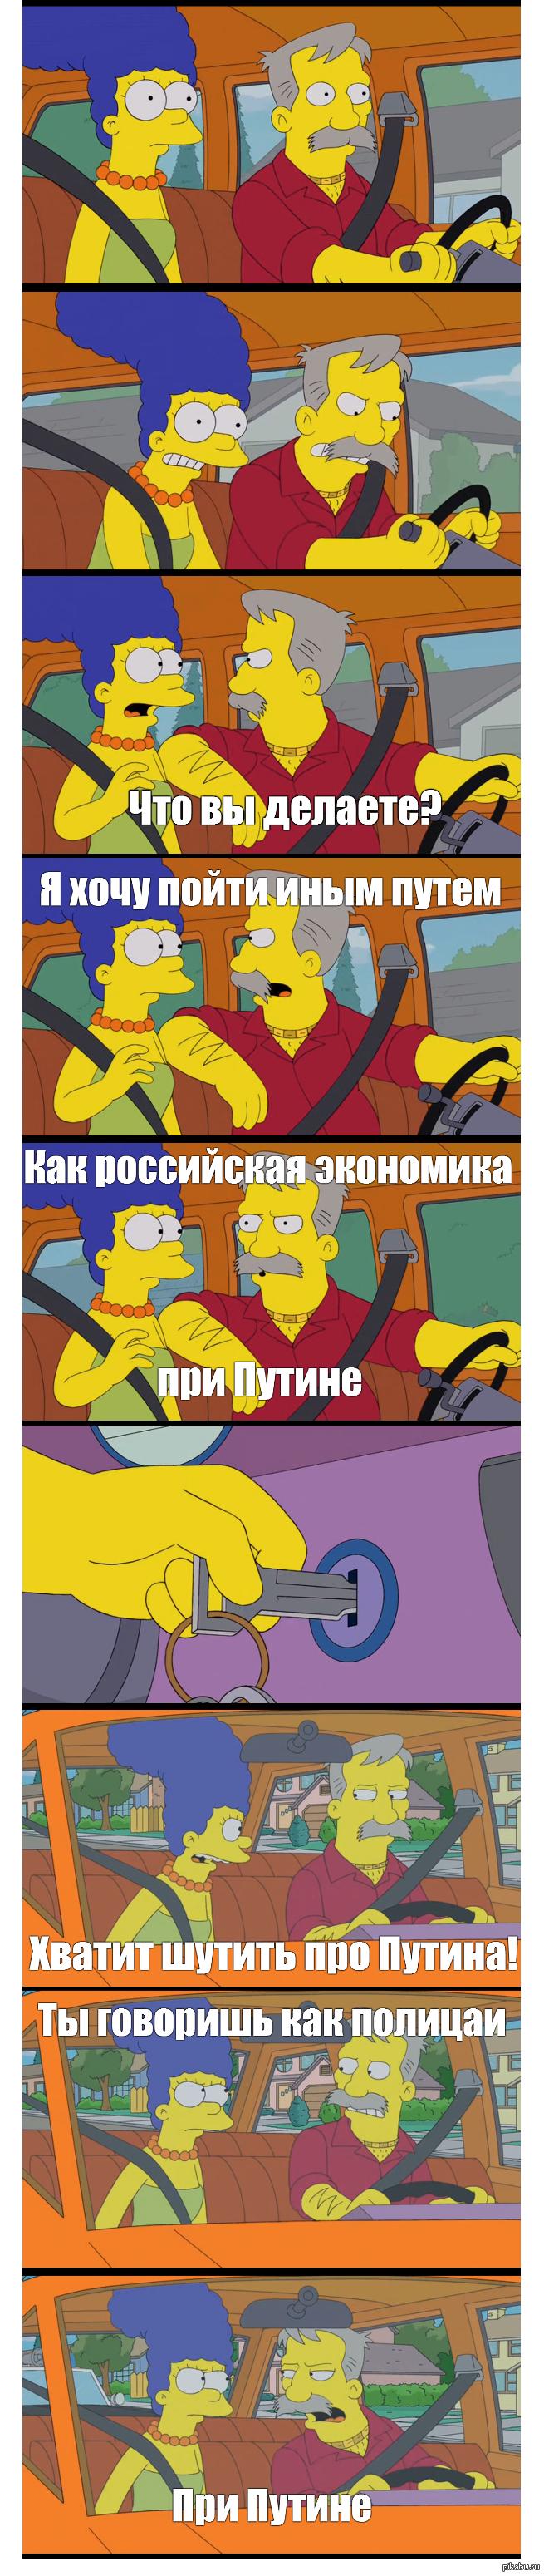 Симпсоны тоже любят шутки про Путина) p.s. s24e20